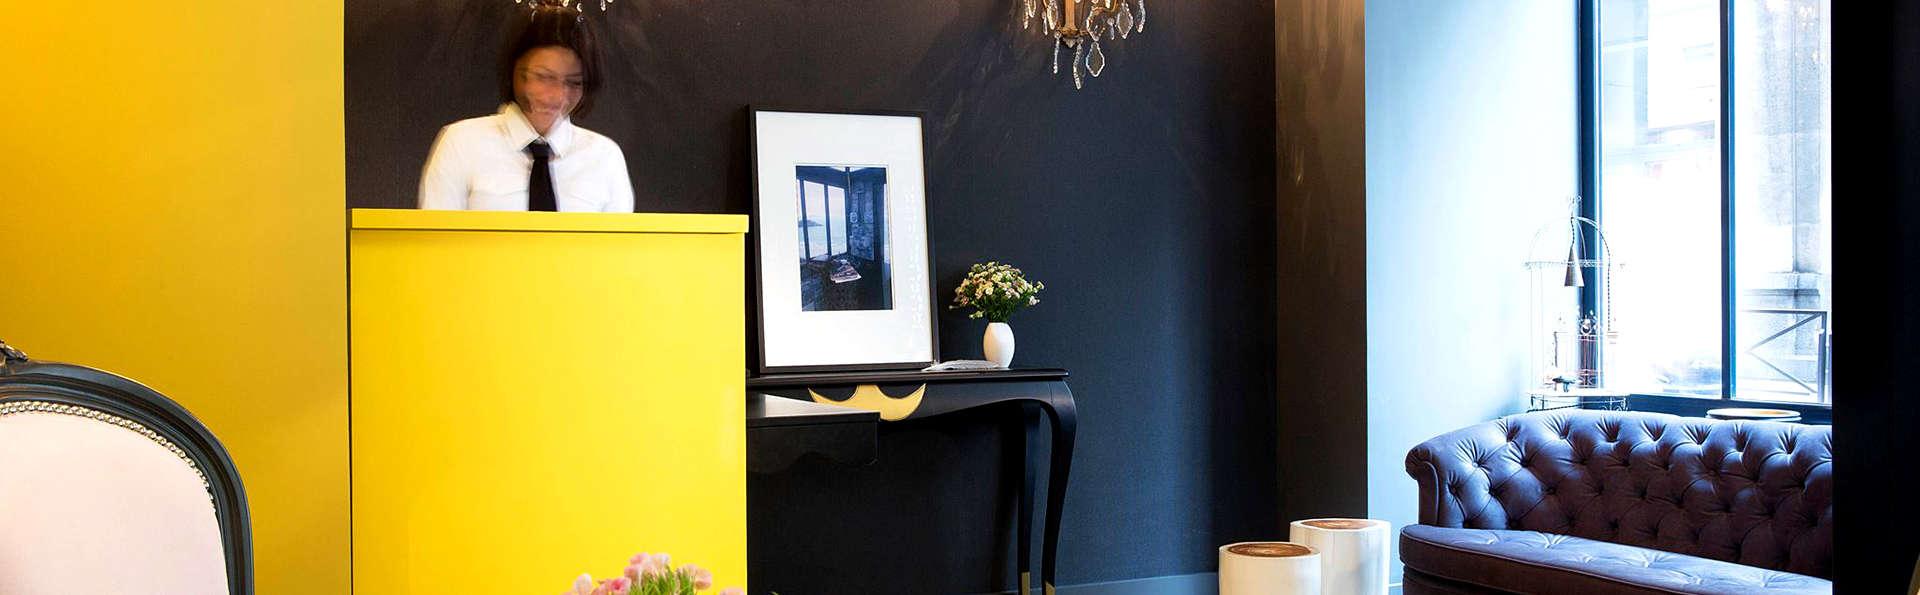 les plumes h tel 4 paris france. Black Bedroom Furniture Sets. Home Design Ideas